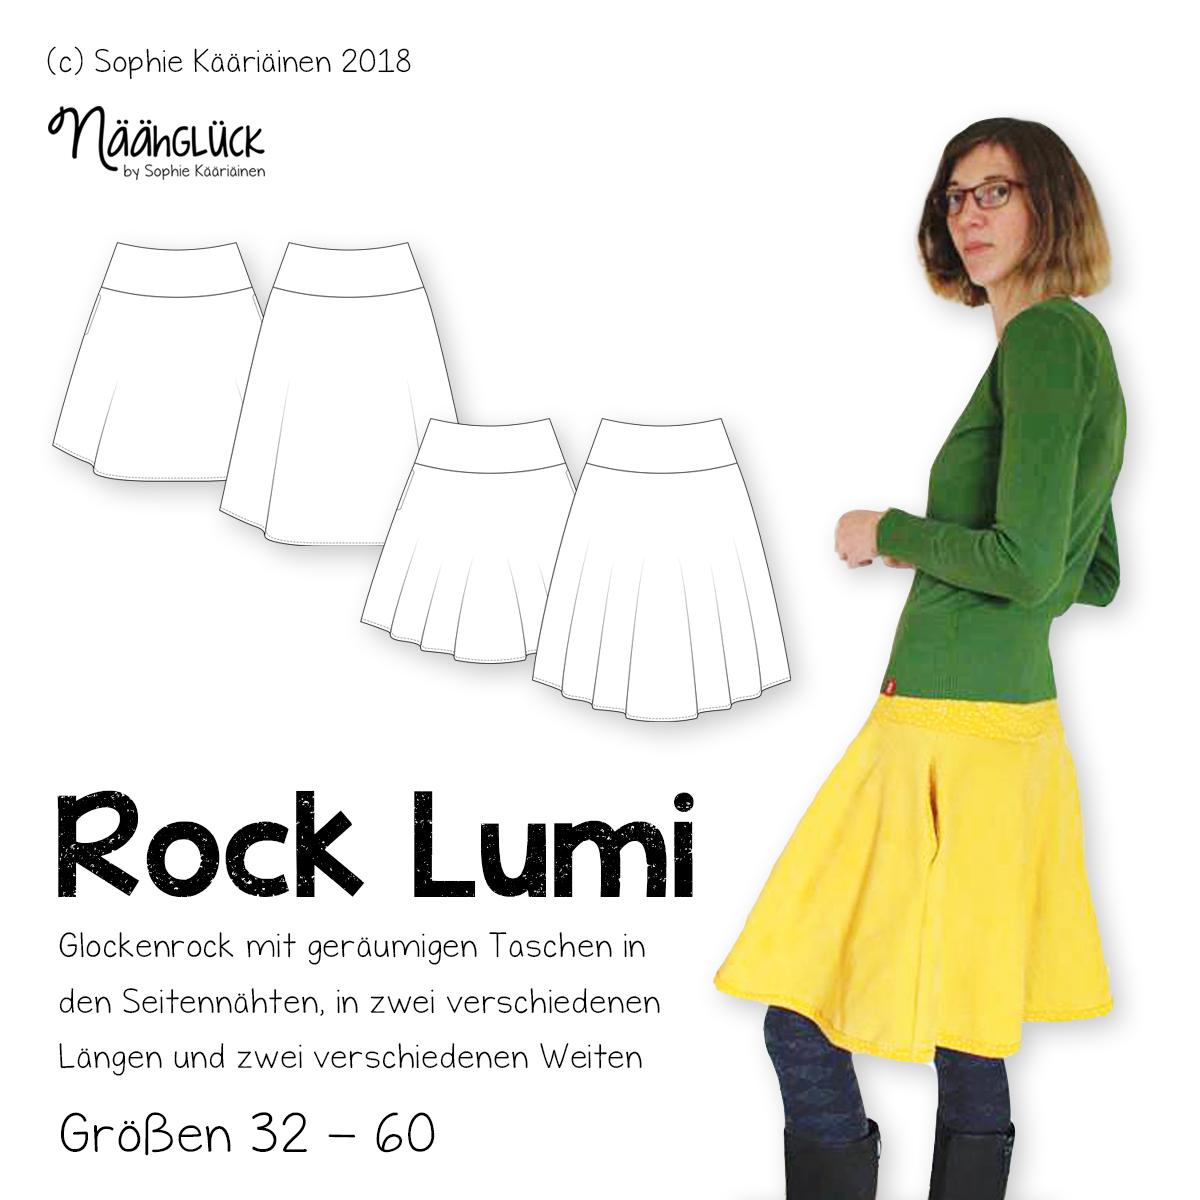 eBook Rock Lumi – Größe 32 – 60